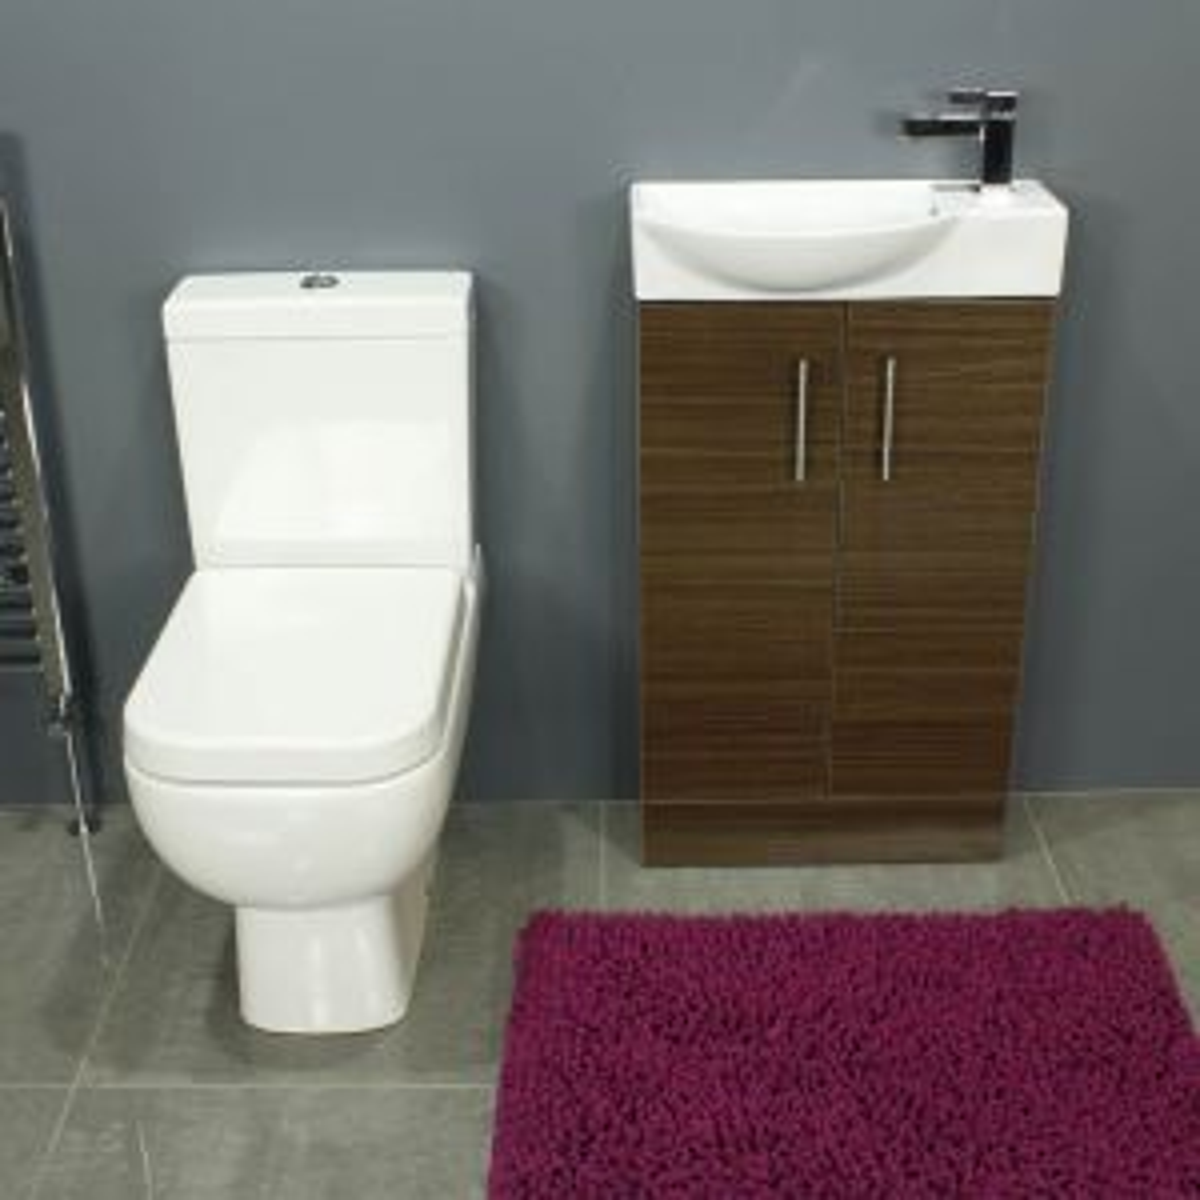 RAK Series 600 Close Coupled Toilet and 500 Series Walnut Mini Double Door Vanity Unit Front